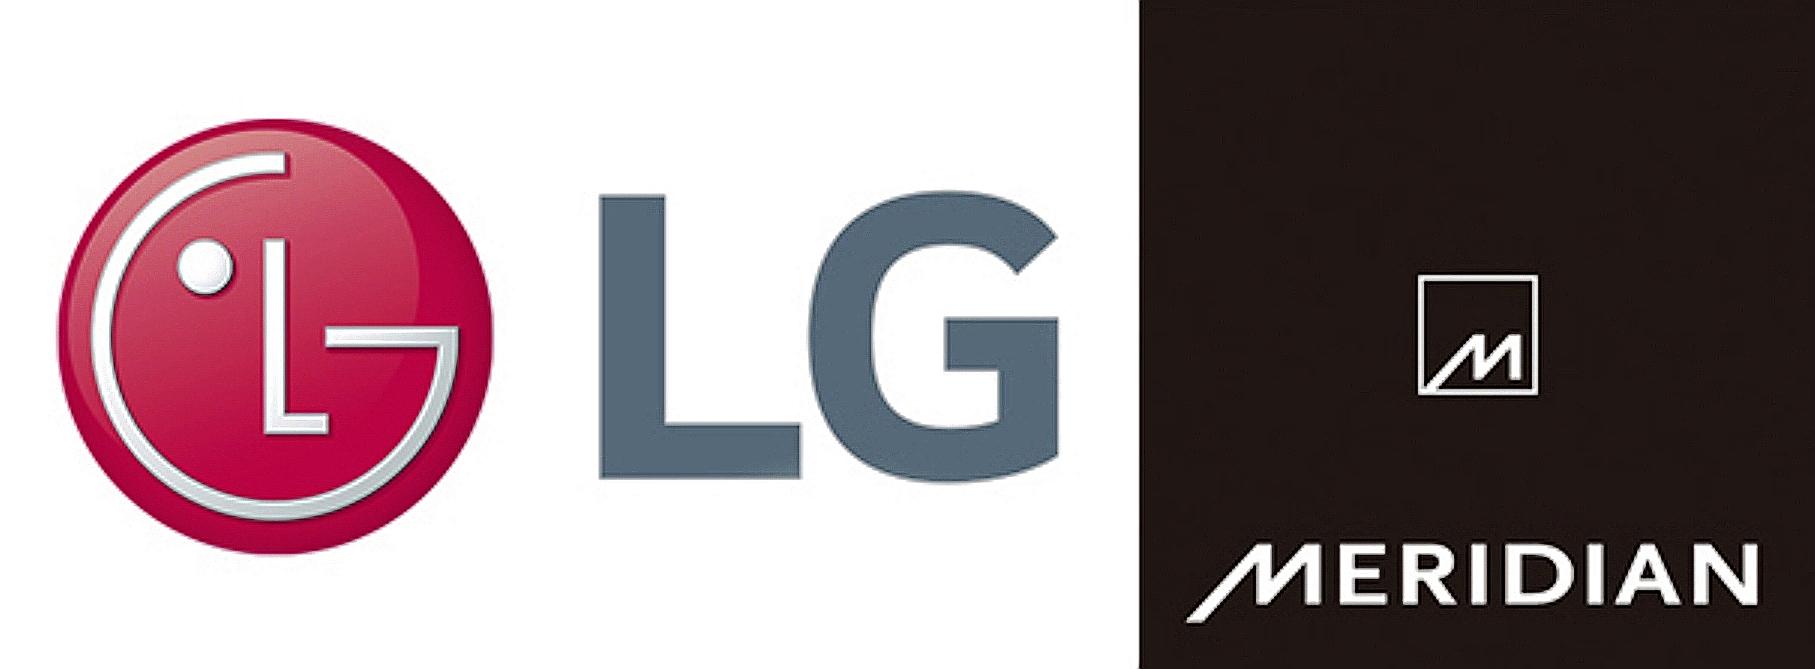 lg_merdian_logo.jpg